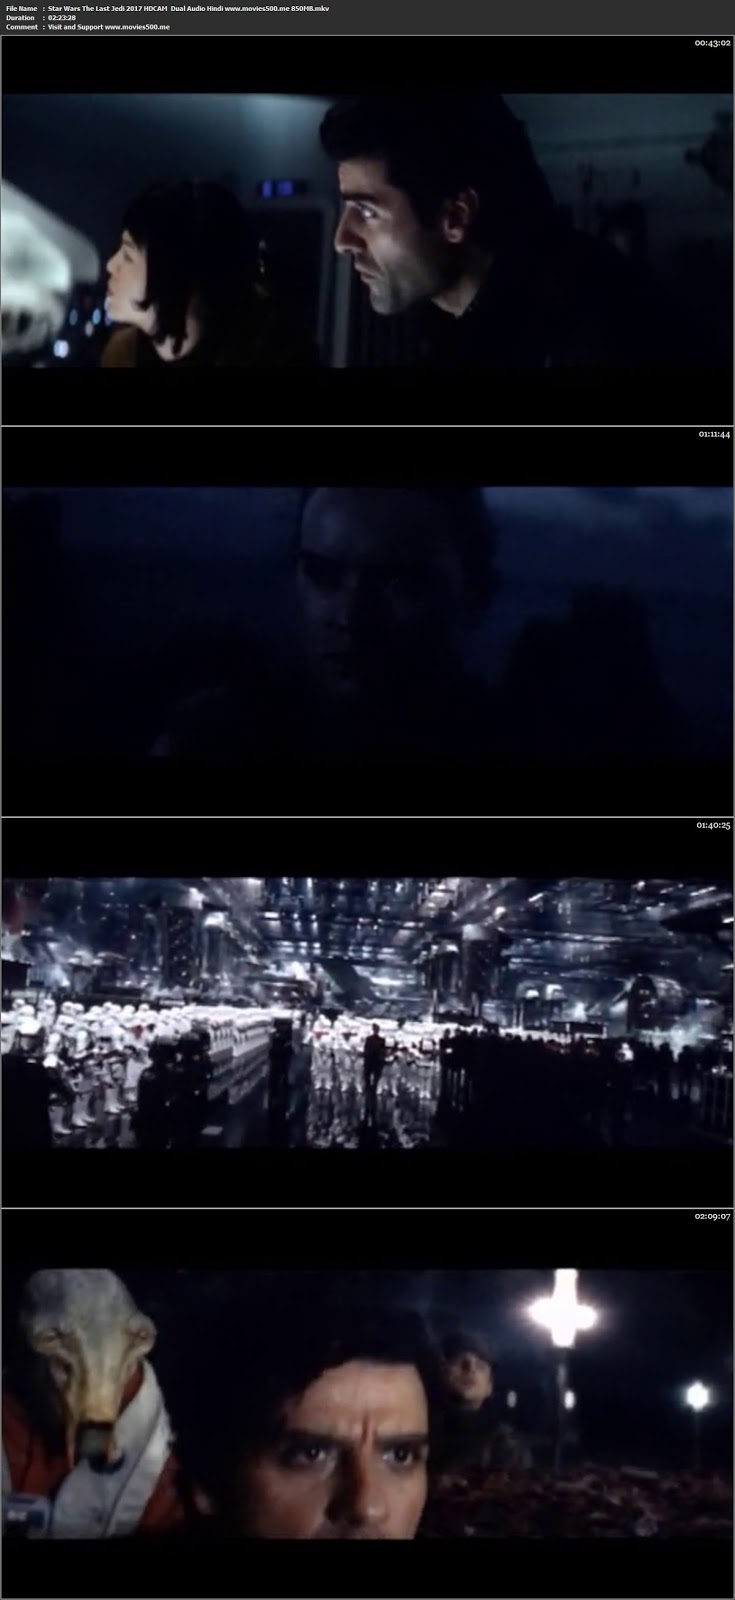 Star Wars The Last Jedi 2017 Dual Audio Hindi HDCAM 720p at rmsg.us